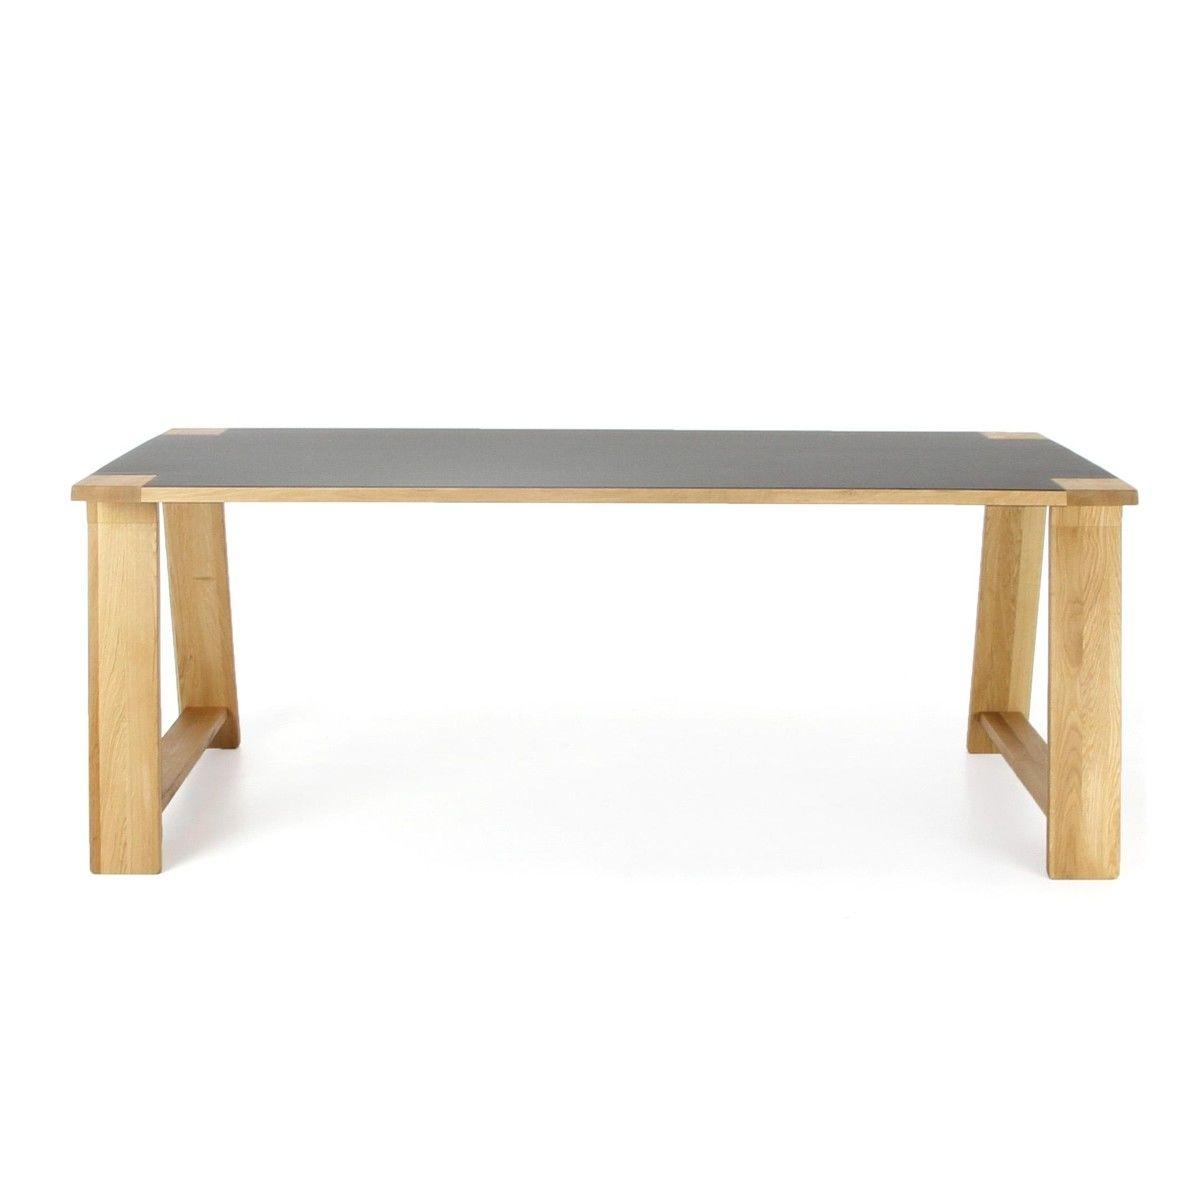 Lino table de salle manger en bois adwood for Table d occasion de salle a manger